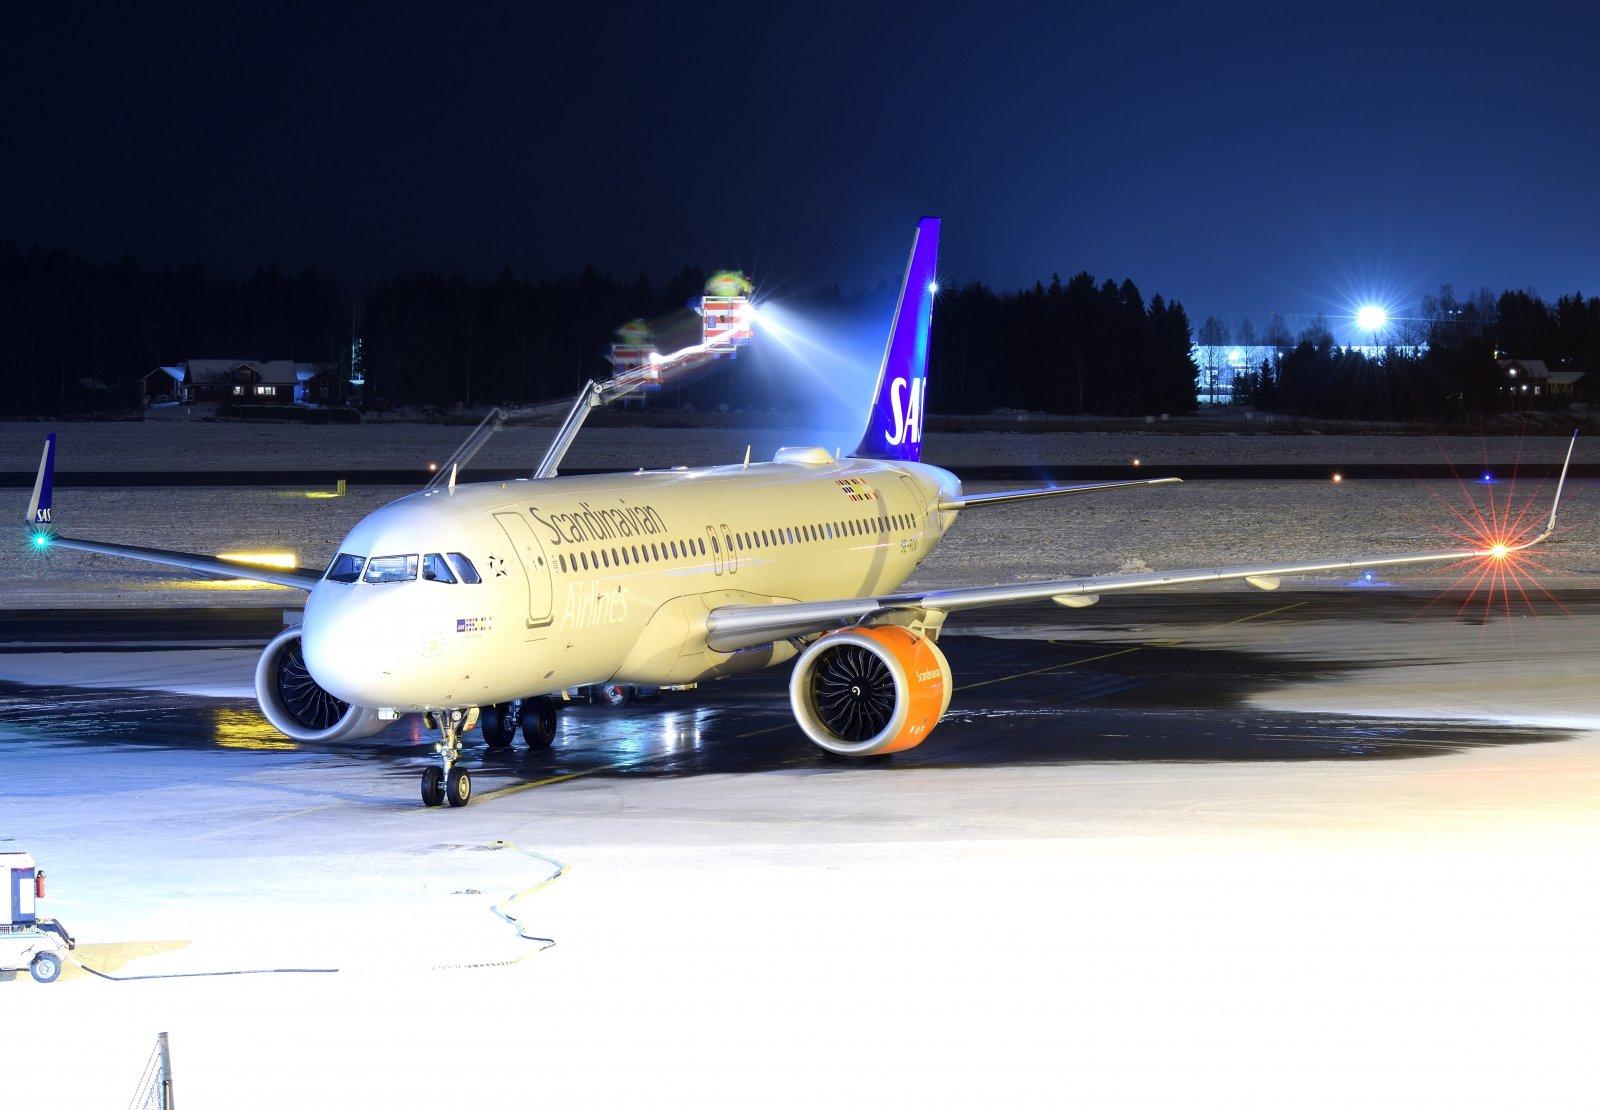 SE-ROA - Airbus A320-251N - SAS Scandinavian Airlines - 3.12.2019